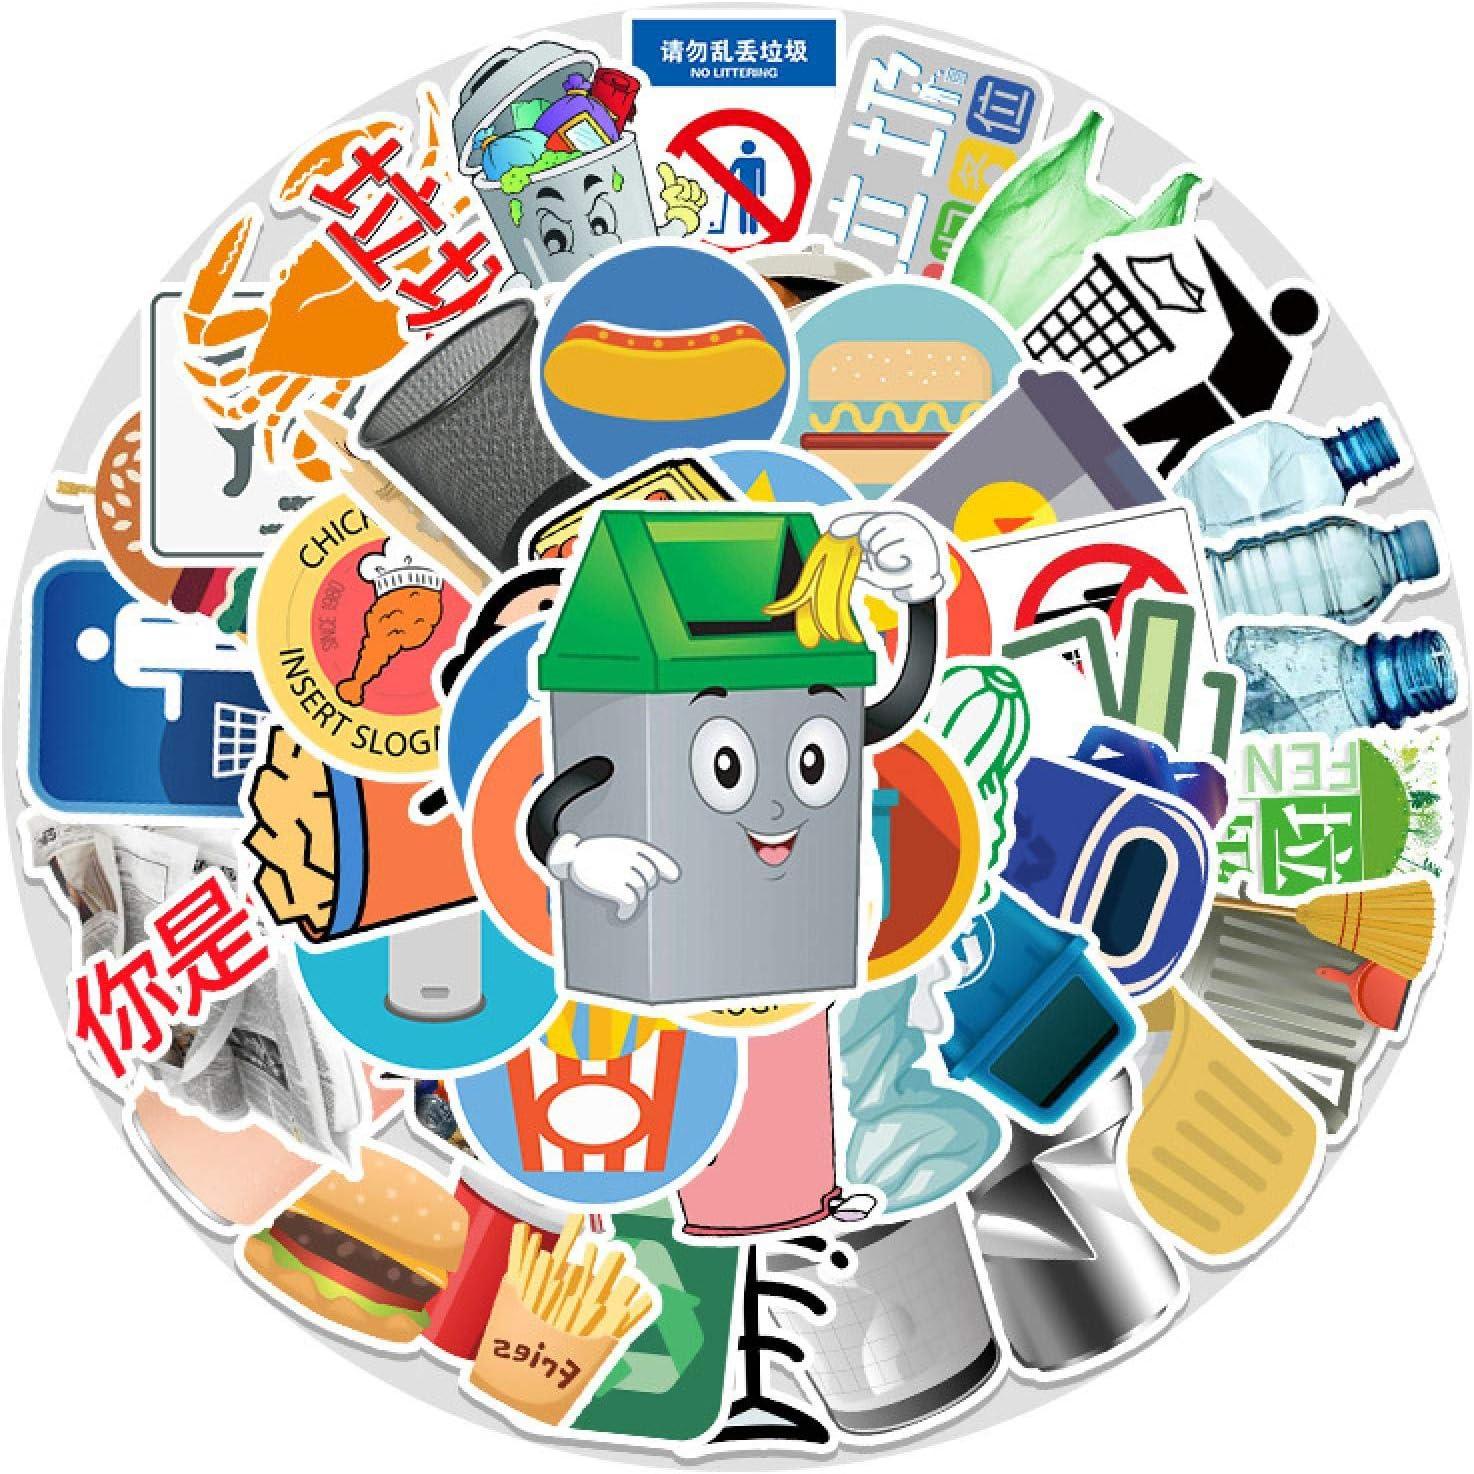 WYZNB Paquete de 54 pegatinas para clasificar basura para ordenador portátil, scooter decoración, graffiti vinilo adhesivo